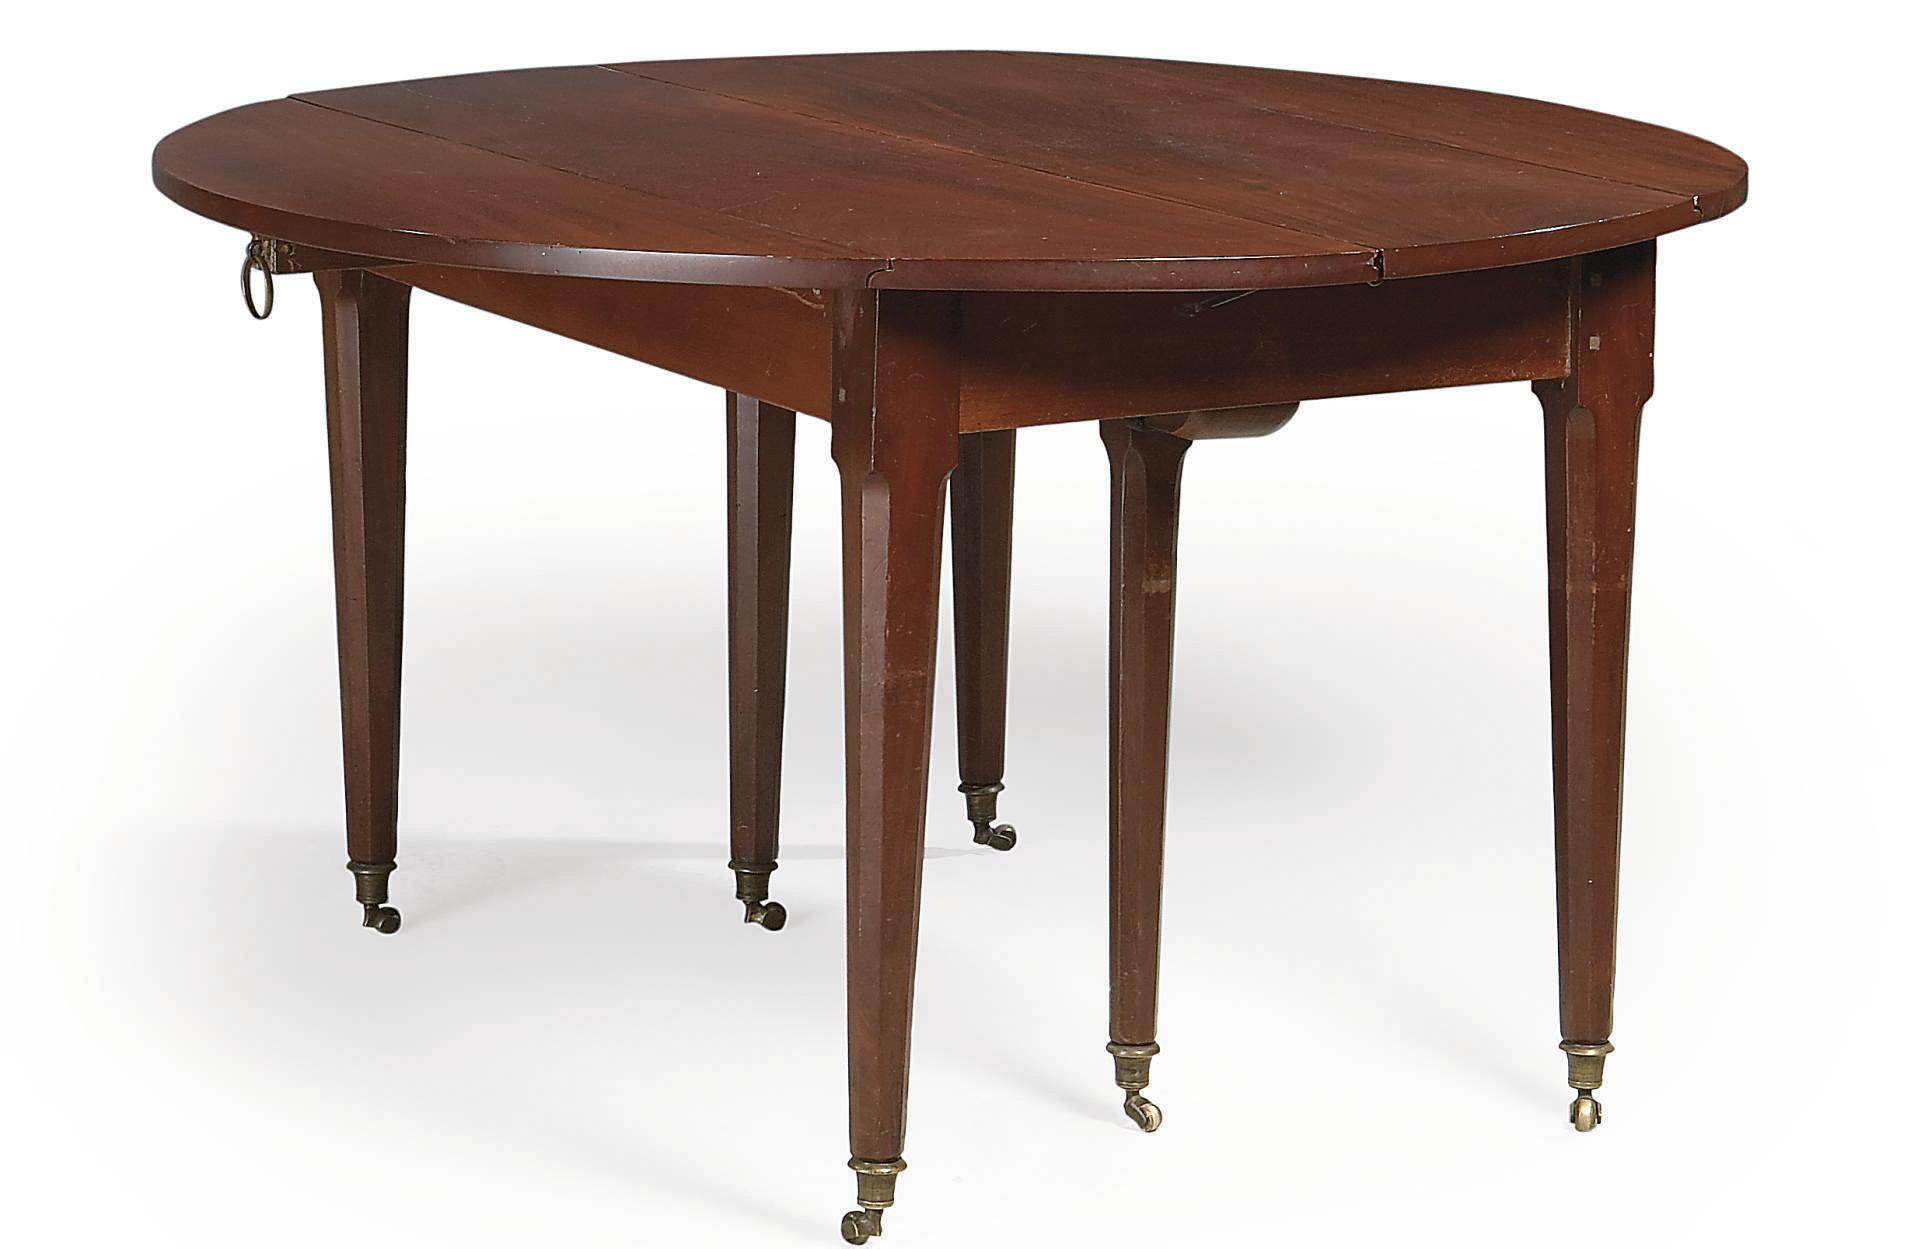 TABLE DE SALLE A MANGER DE STY